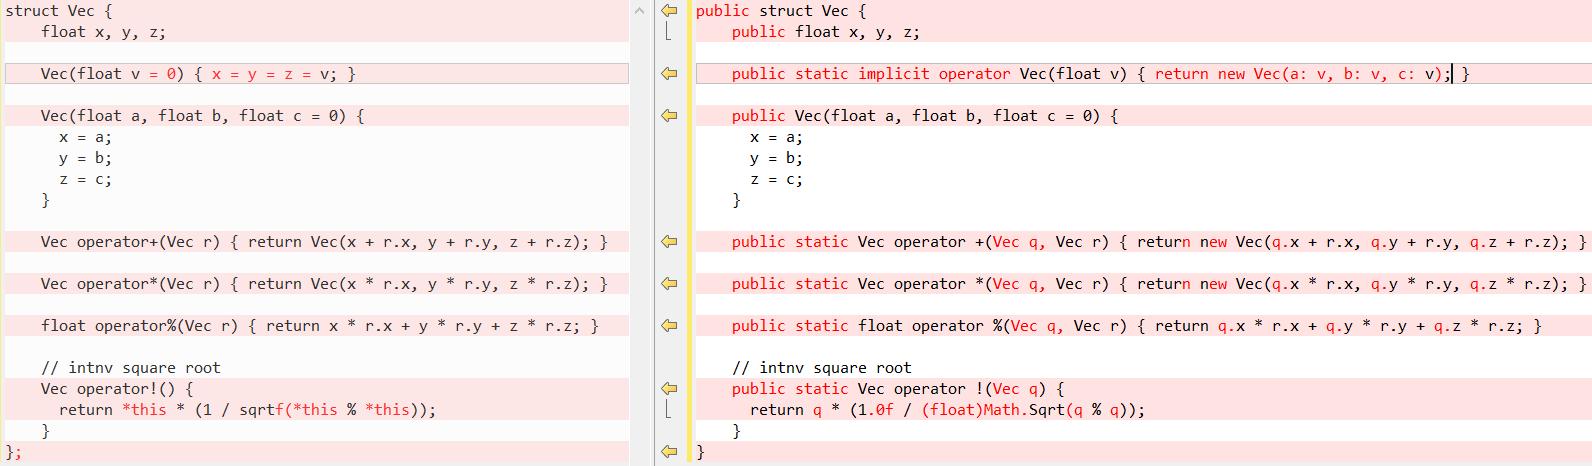 Diff - C++ v. C# - struct Vec